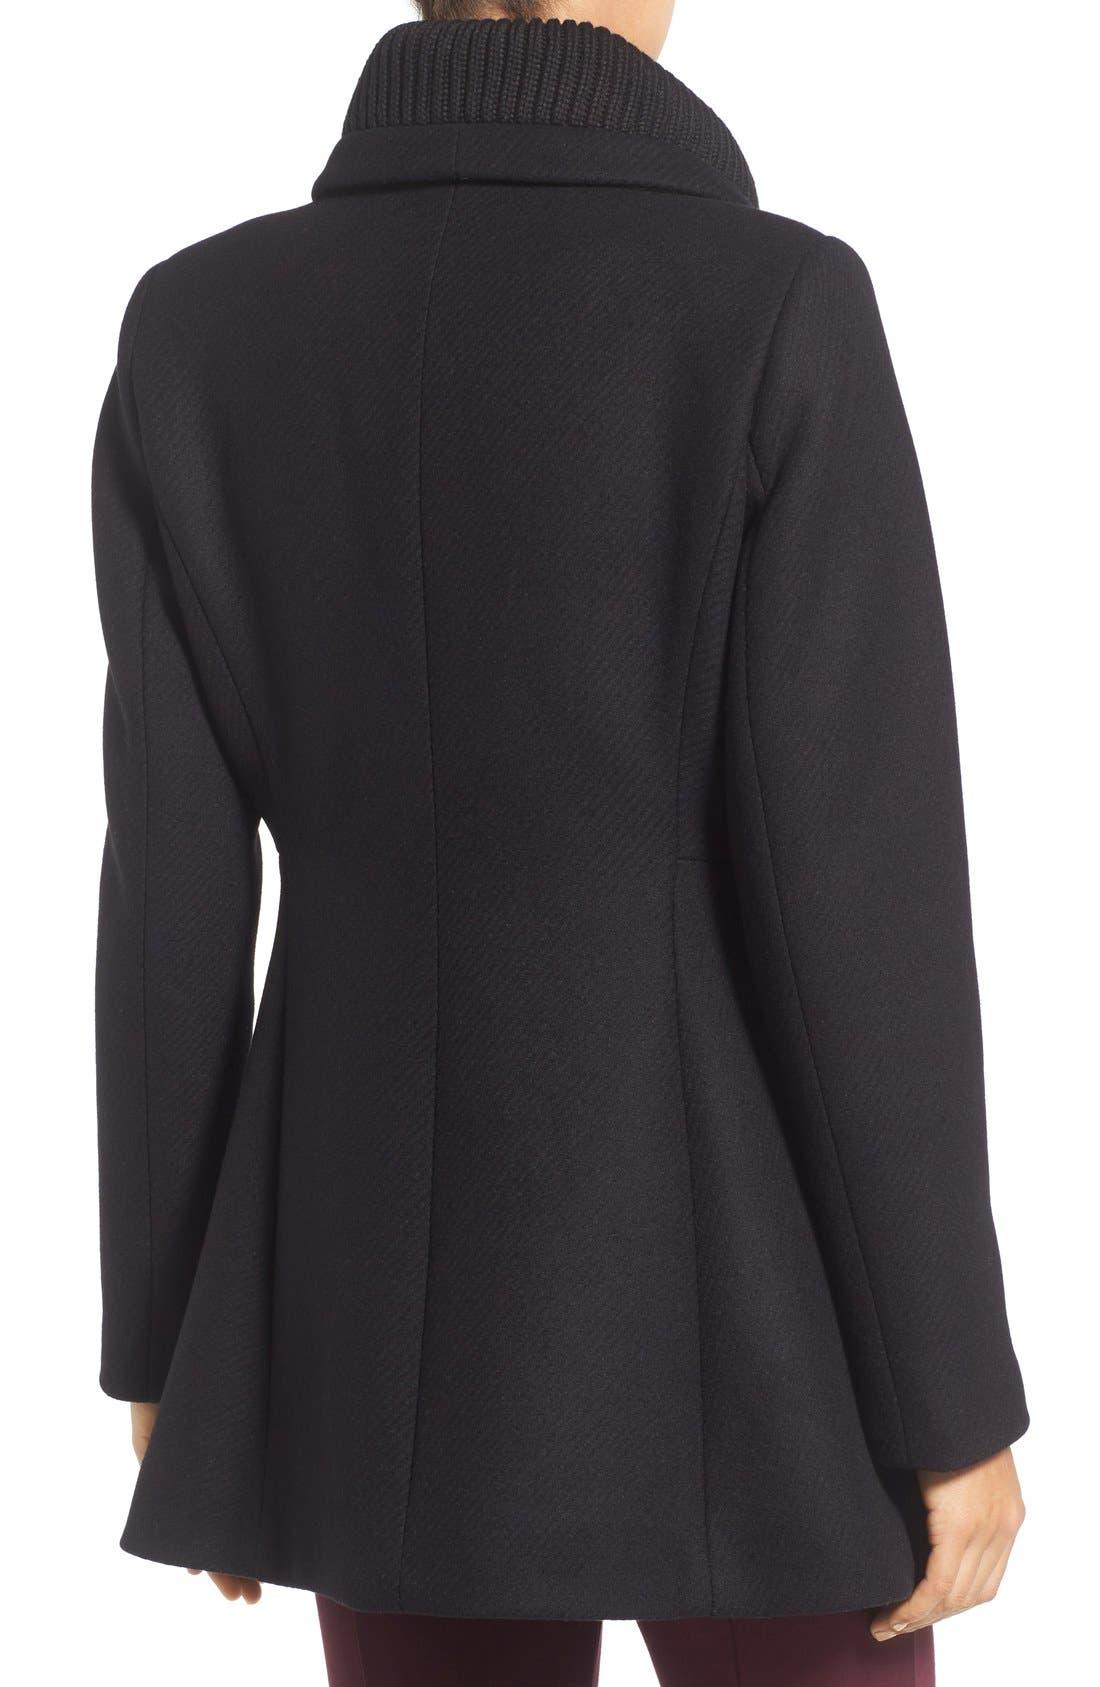 'Maddi' Knit Collar Cutaway Wool Blend Coat,                             Alternate thumbnail 2, color,                             001